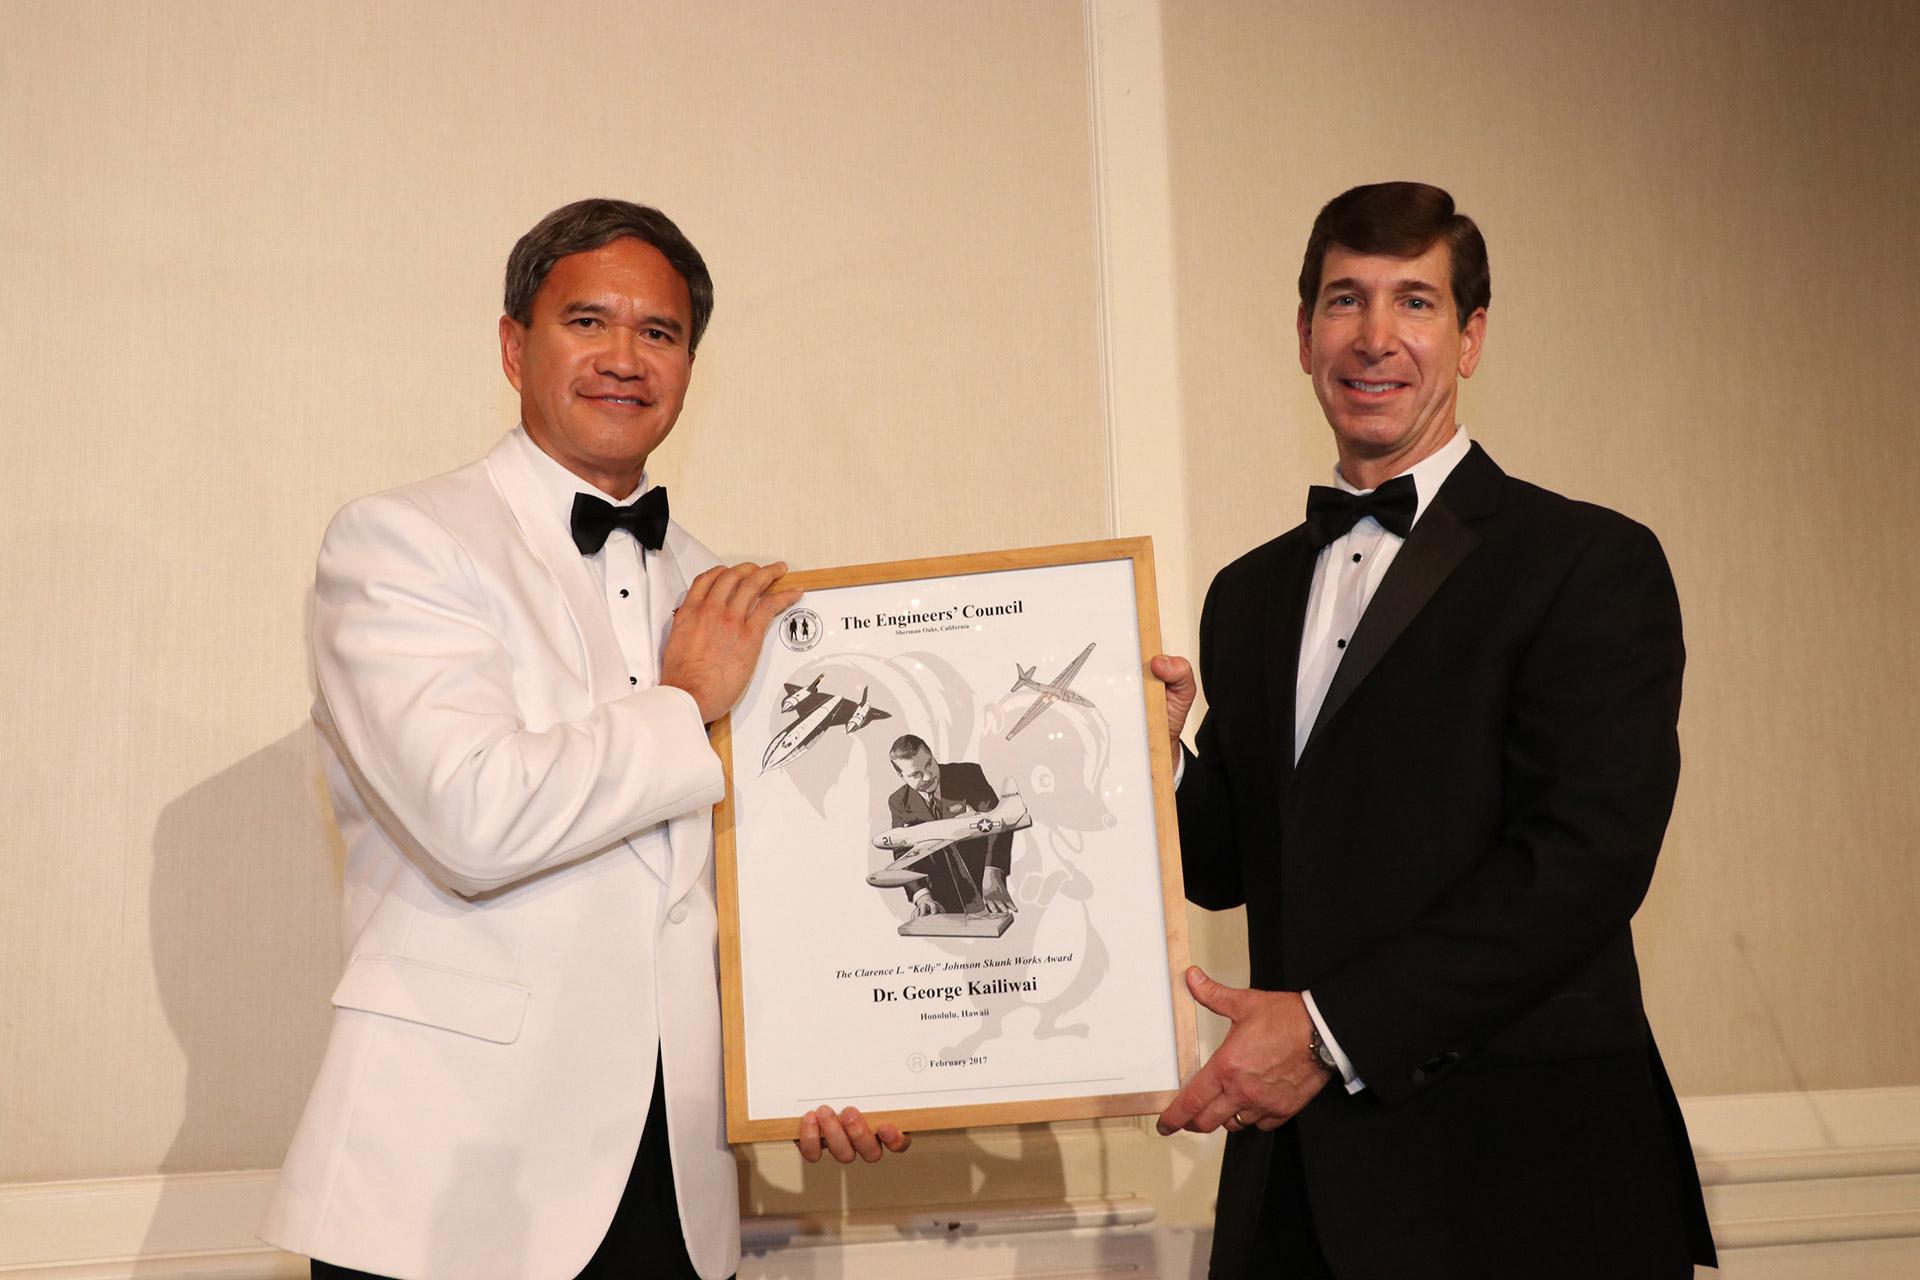 2017 Clarence L Kelly Johnson Skunk Works Award Winner- Dr. George Kailiwai